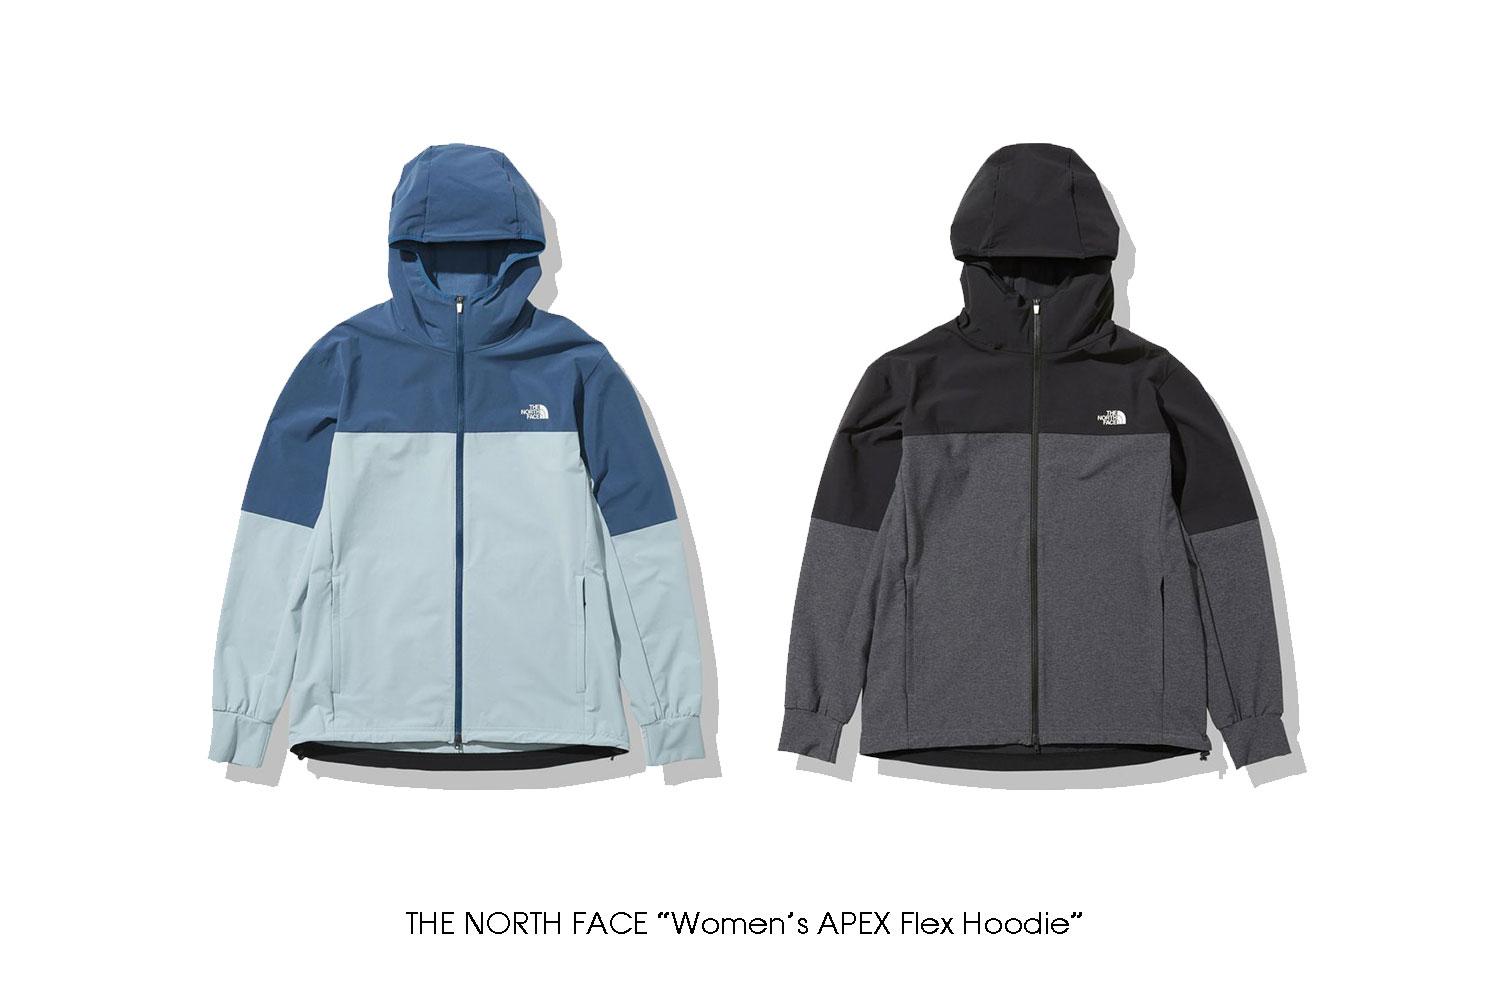 "THE NORTH FACE ""Women's APEX Flex Hoodie"""